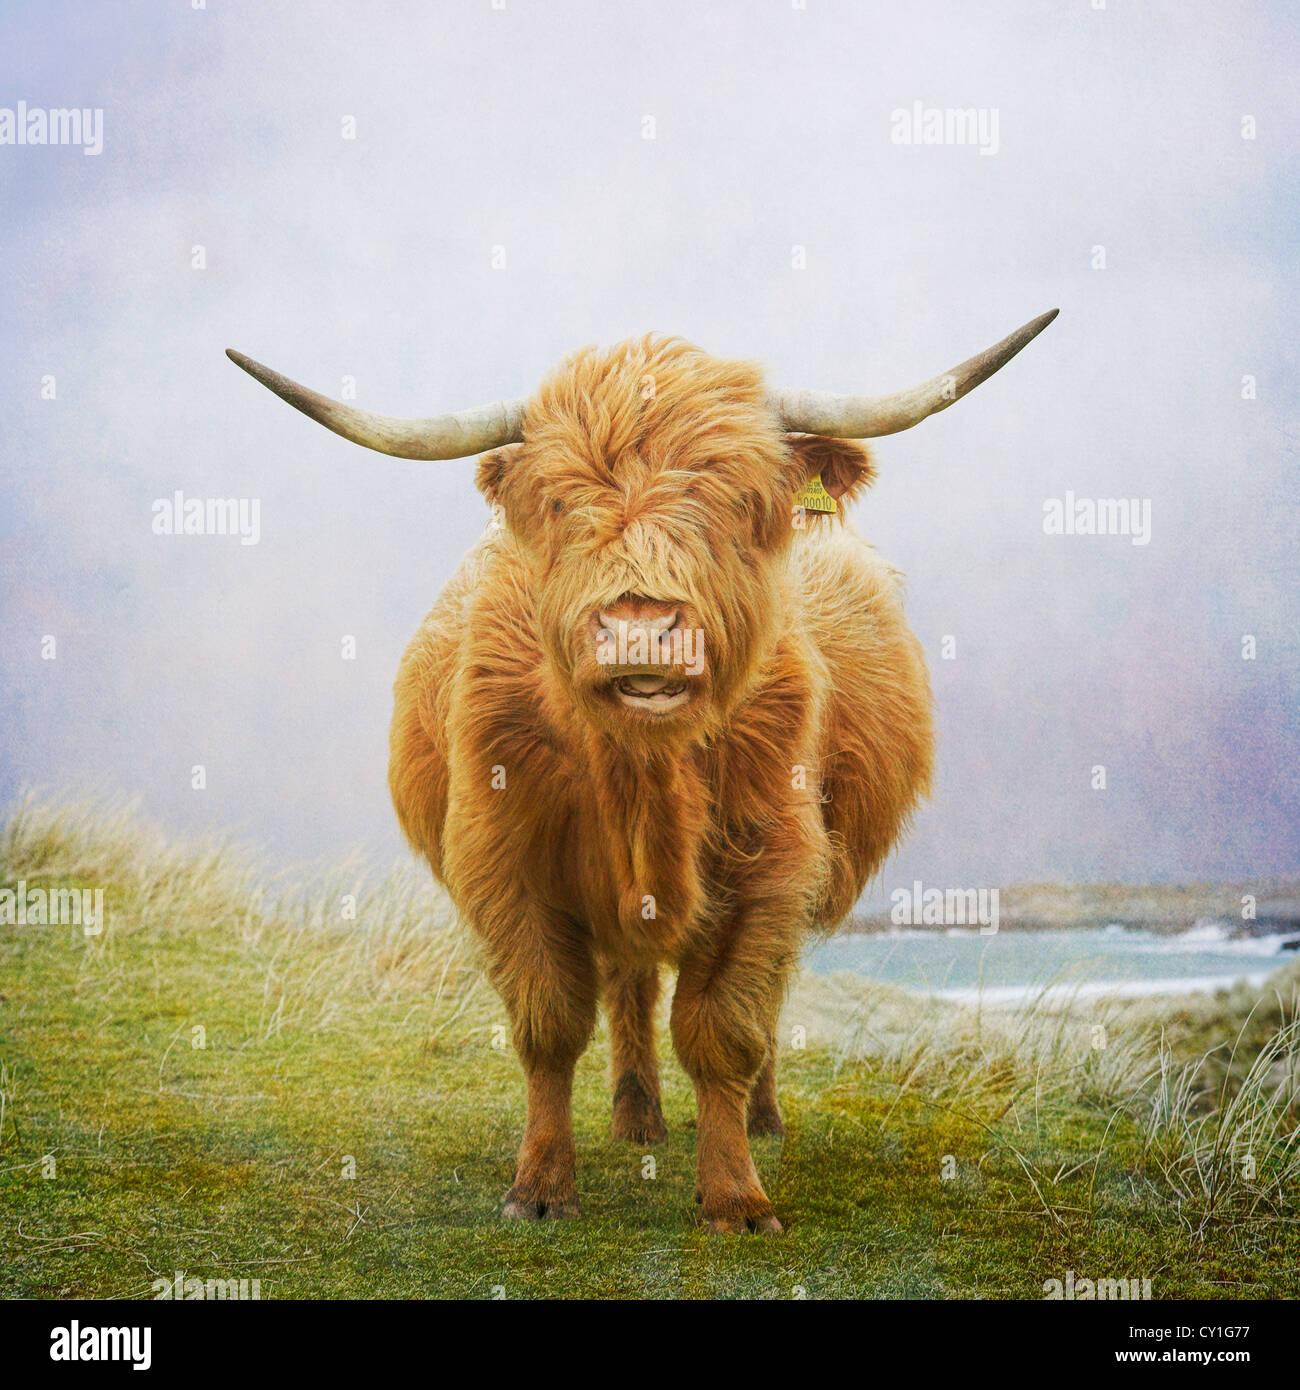 Highland cow, Hebrides - Stock Image